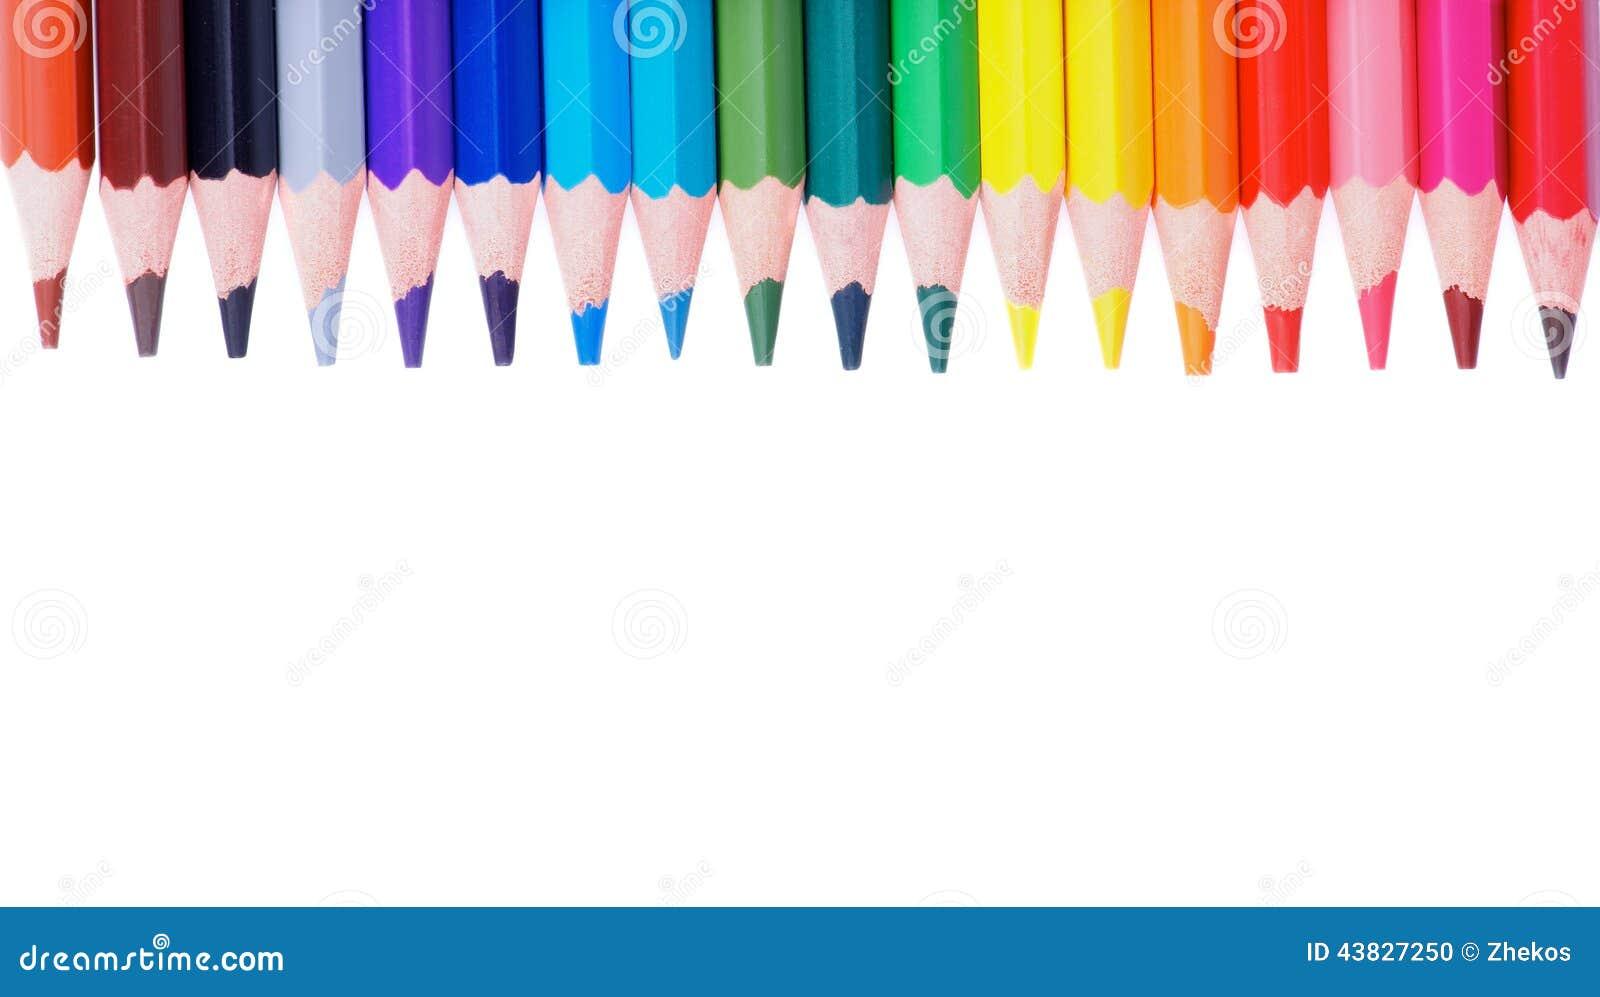 Colorful Pencils Border Stock Photo Image 43827250